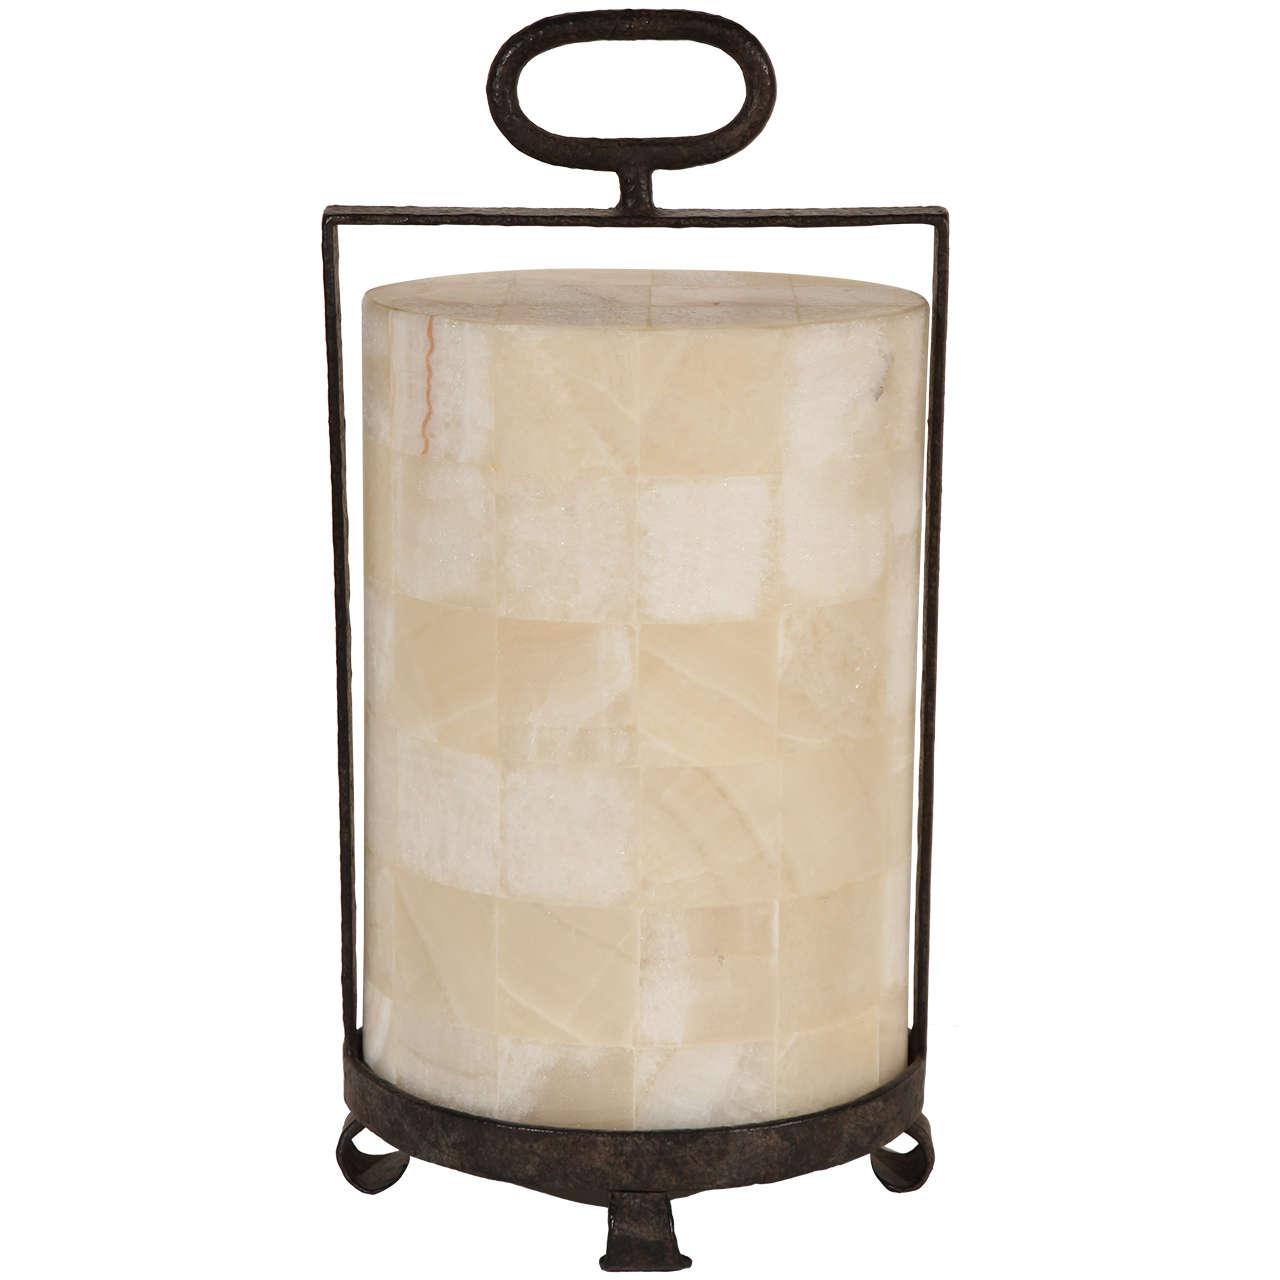 Modern Rustic Quartz and Iron Lantern Style Table Lamp